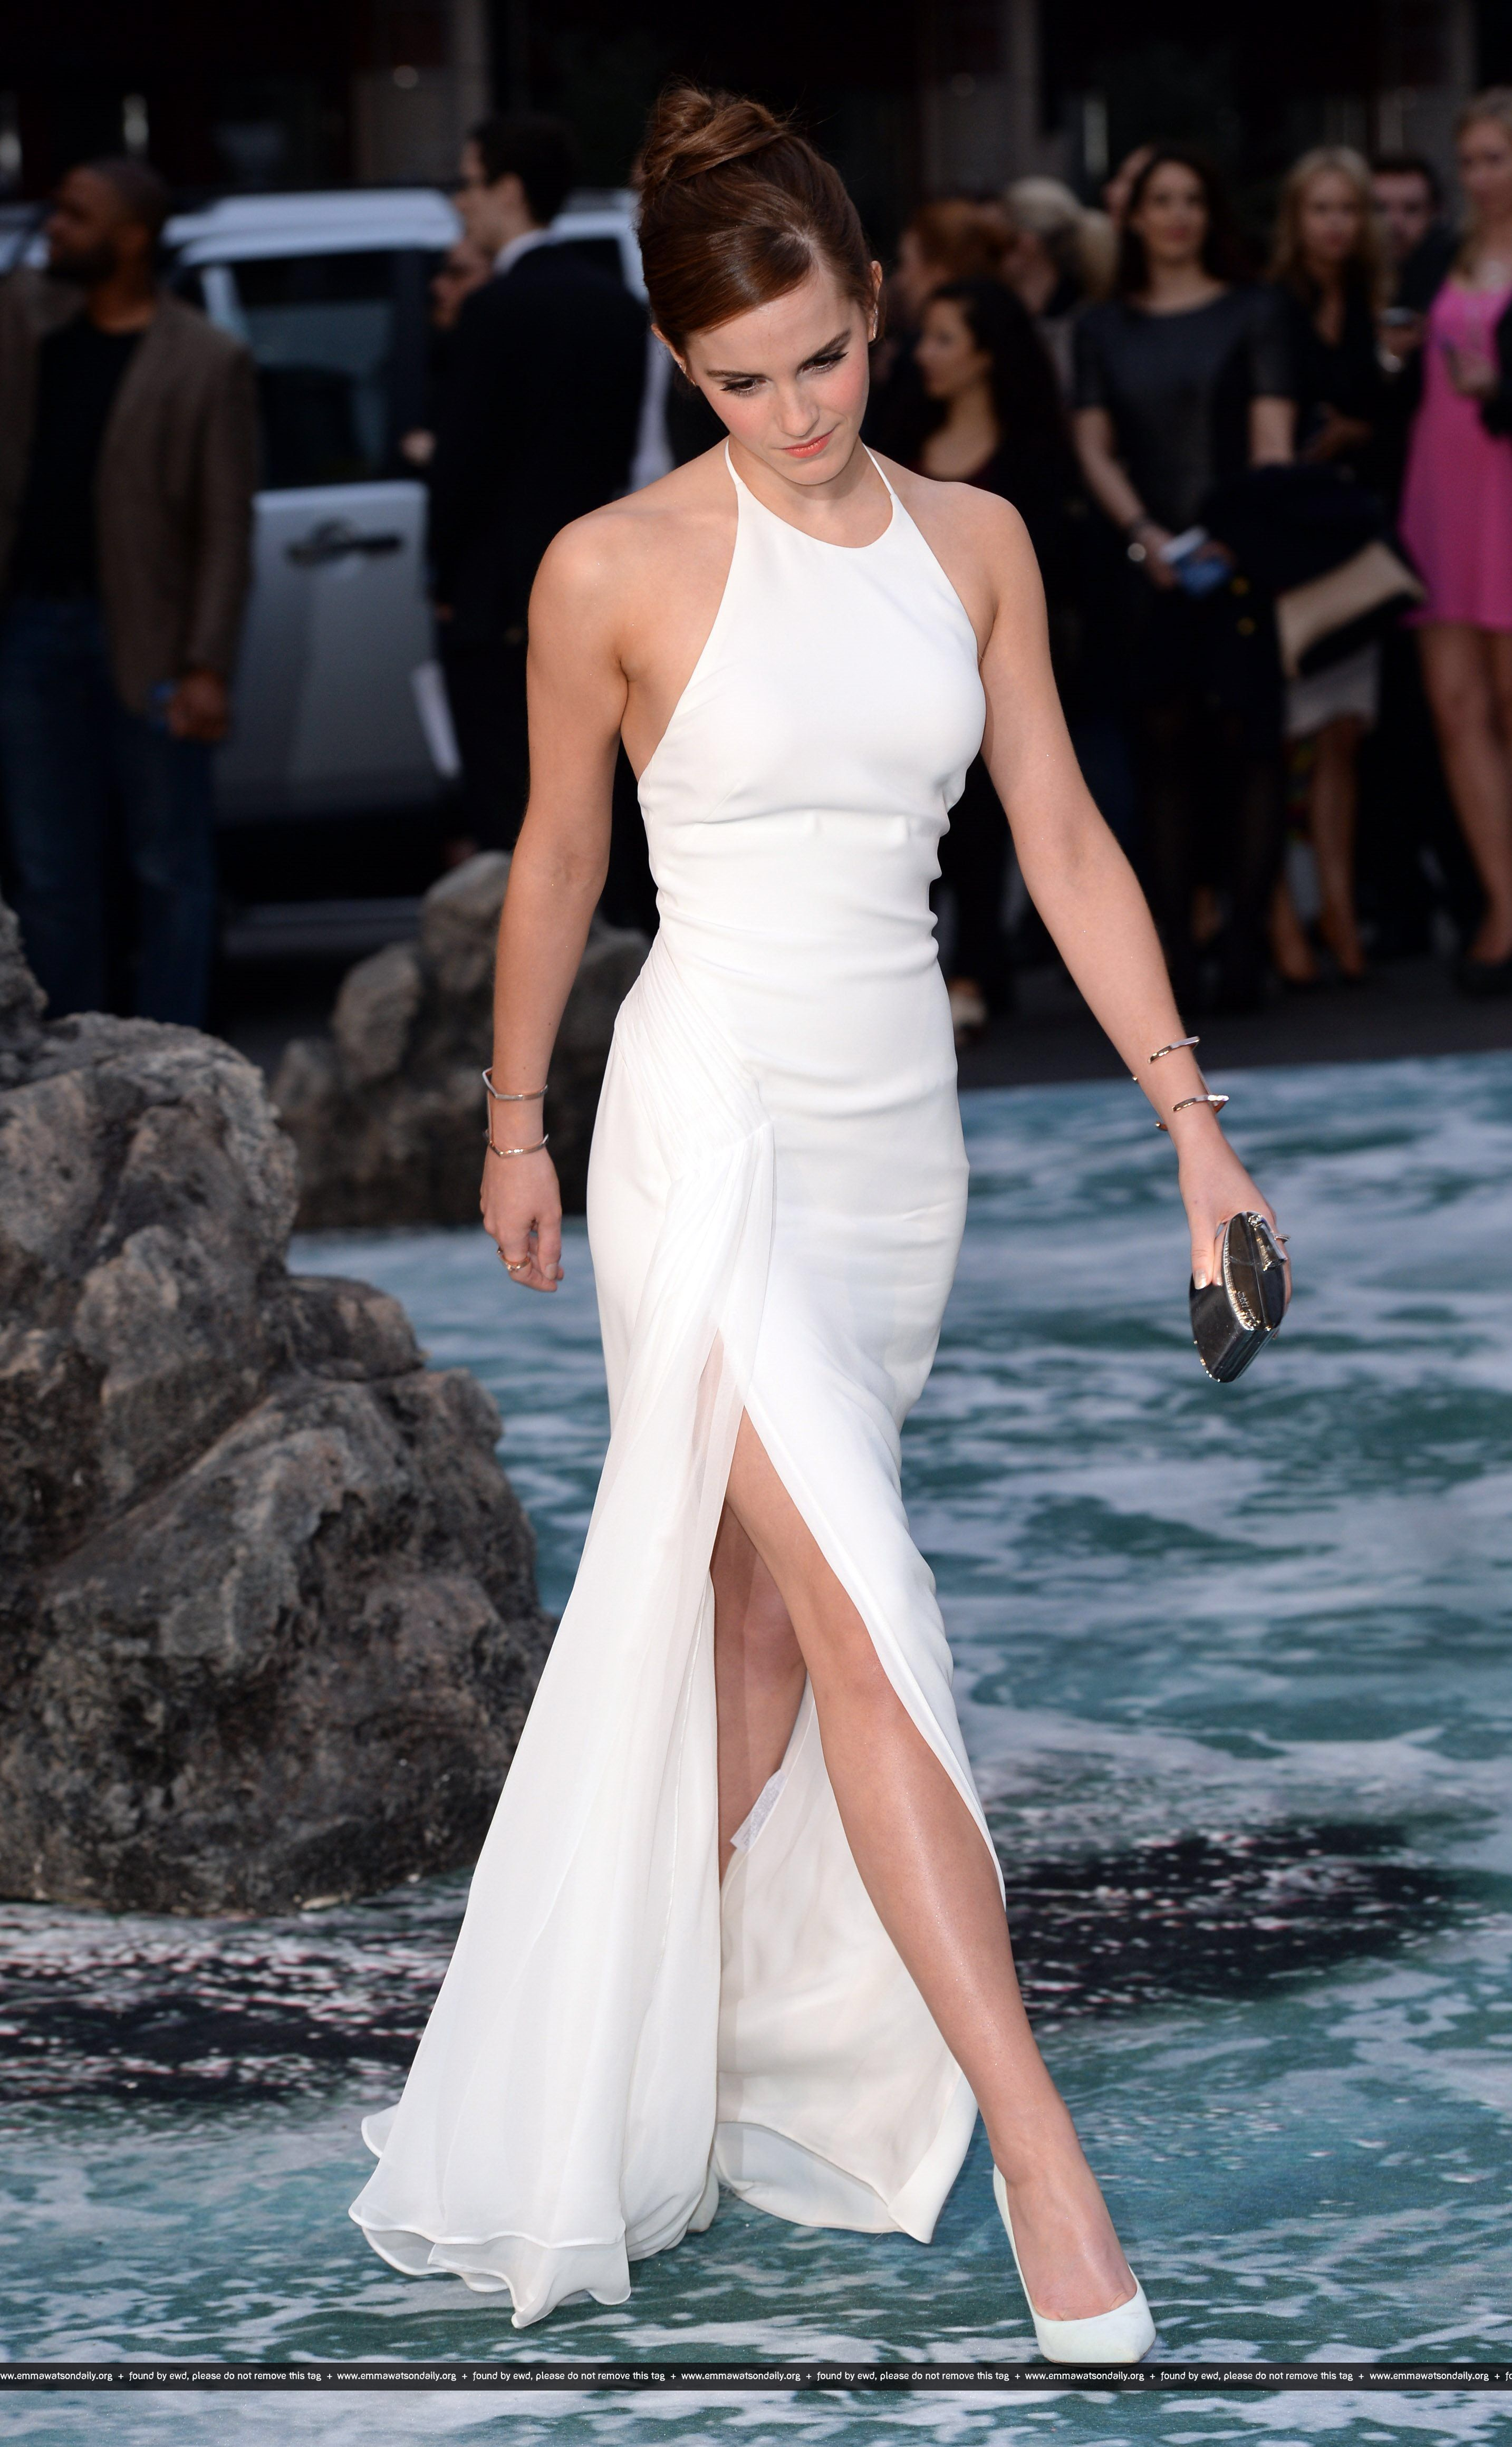 White dress emma watson - Emma Watson For More Visit Www Charmingdamsels Tk